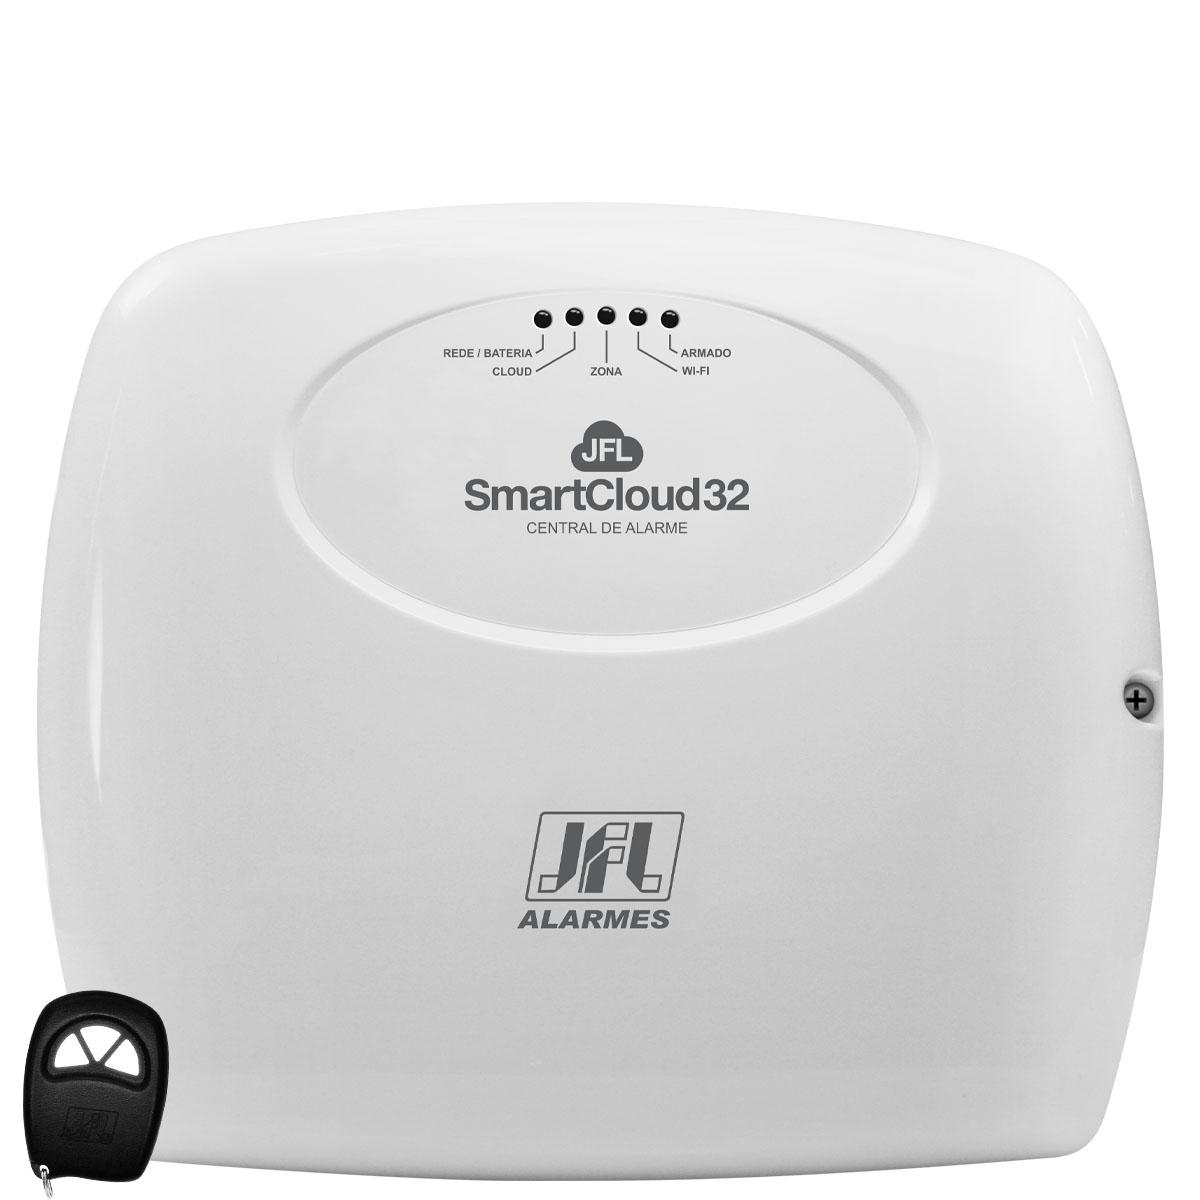 Kit Alarme SmartCloud 32 Jfl Com 2 Sensores Idx 1001